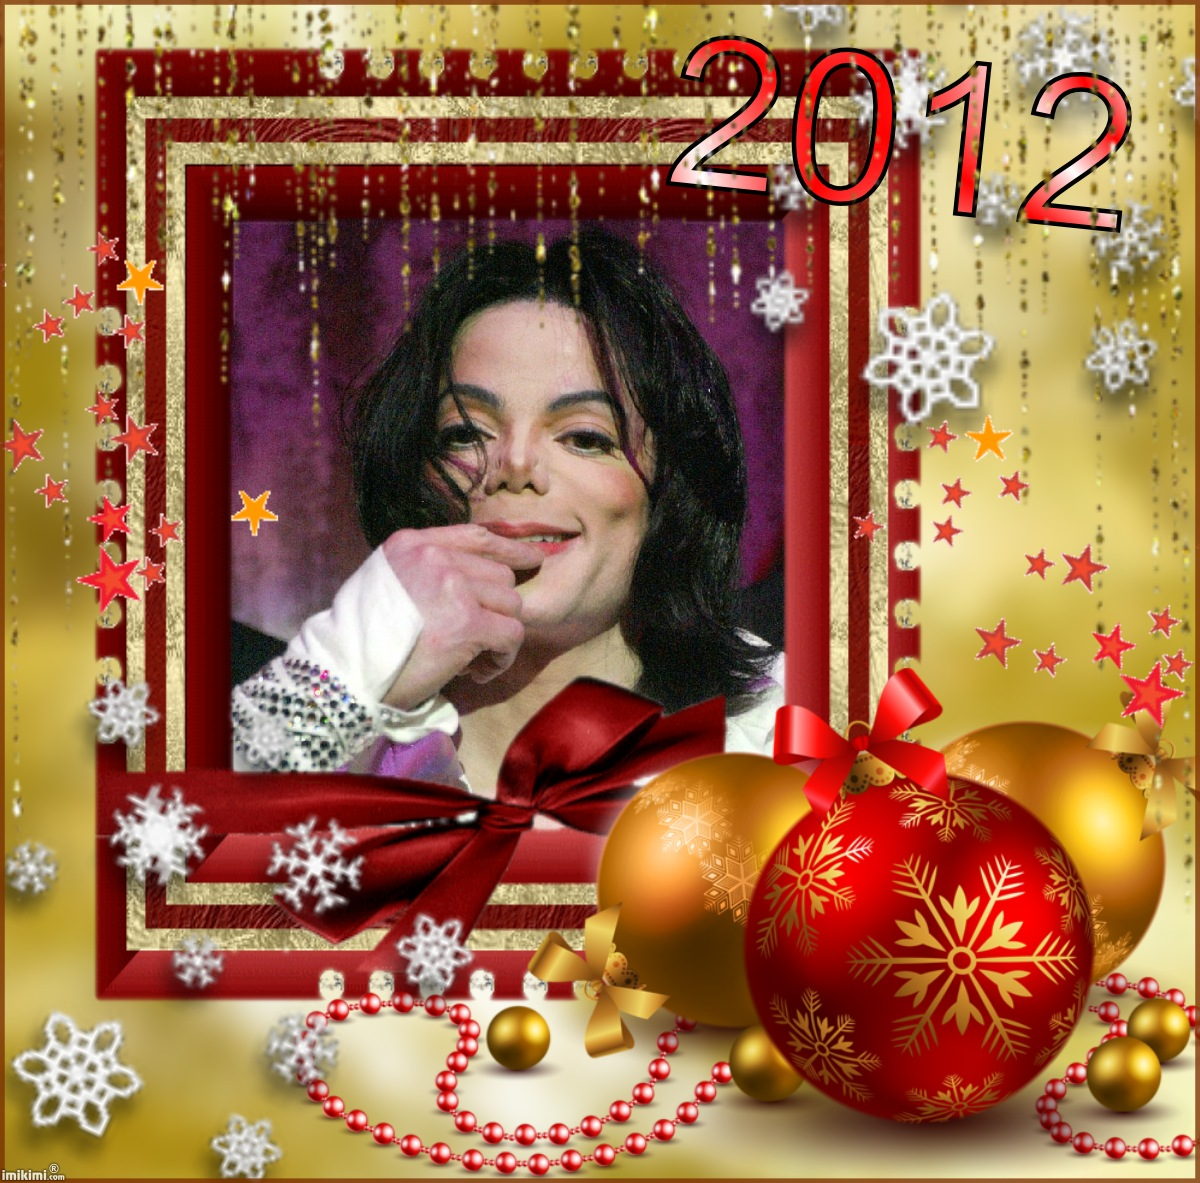 HAPPY NEW YEAR MICHAEL!